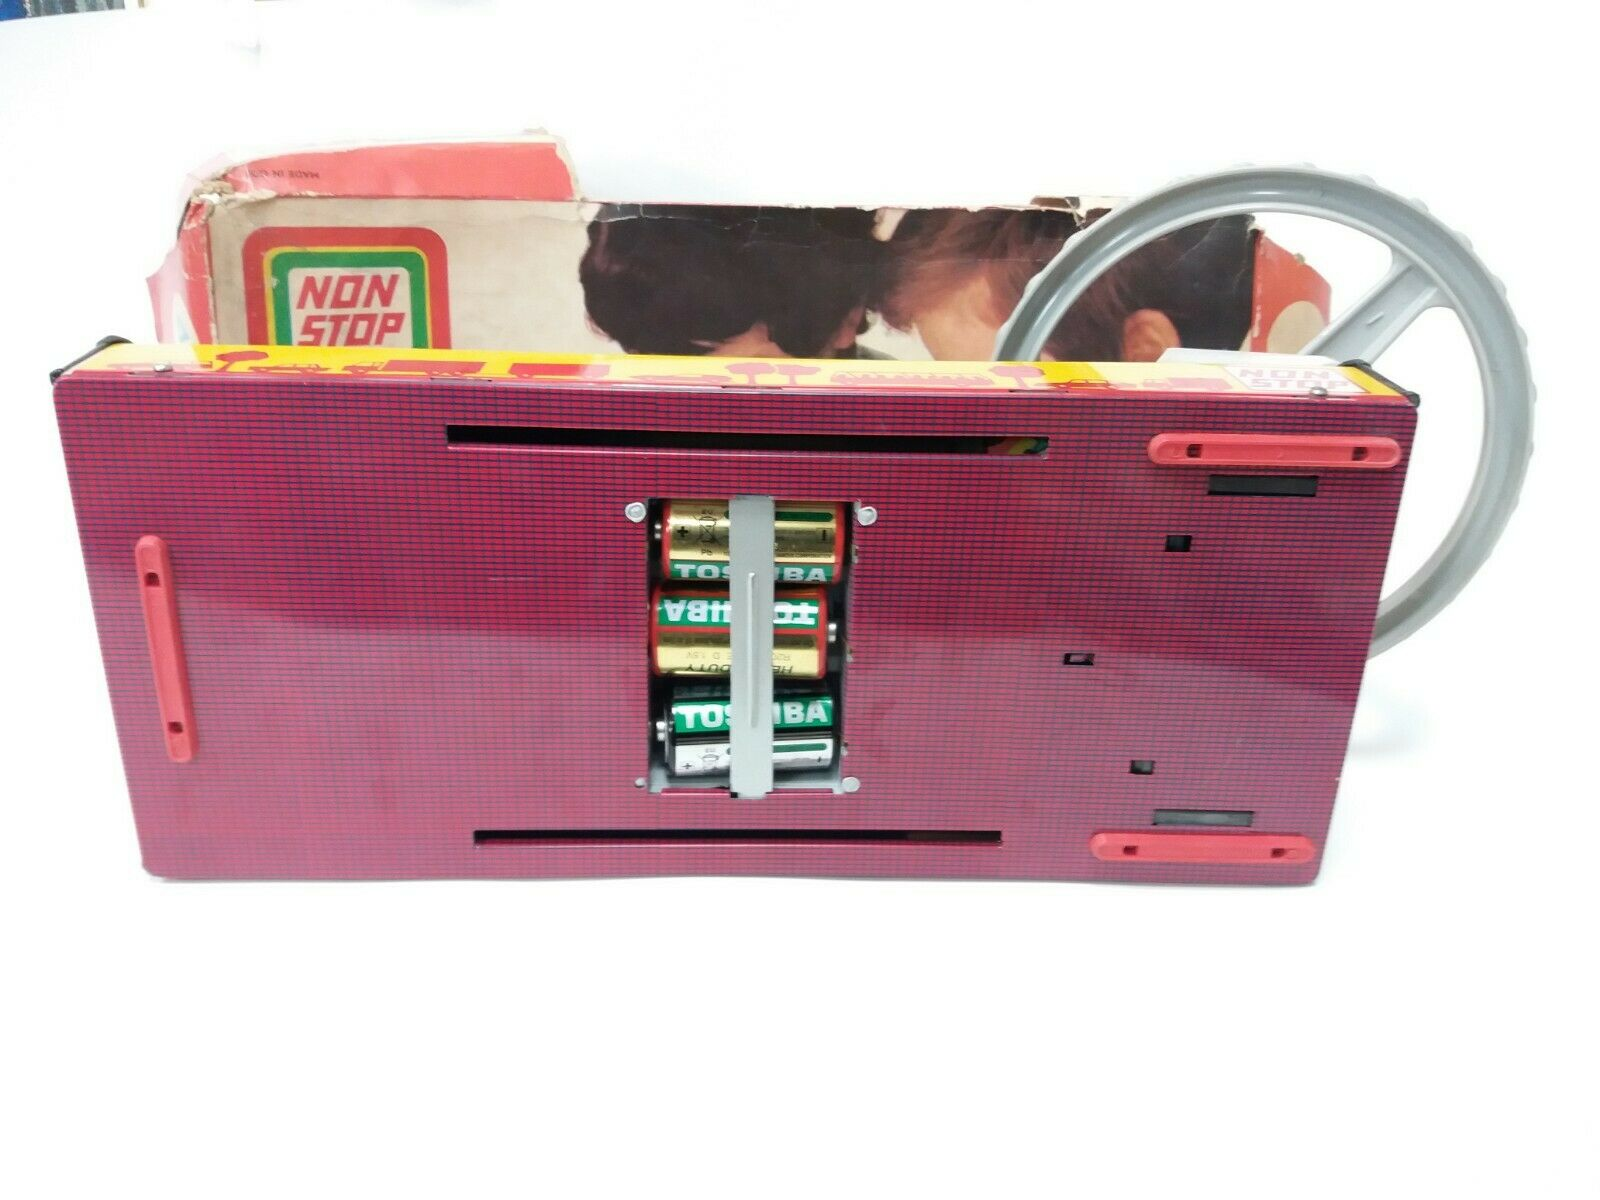 VINTAGE VERY RARE ELECTRO AUTODRO MS BRANDENBURG BRANDENBURG BRANDENBURG TOY GDR 1960 BOARD GAME + BOX 1cc43d